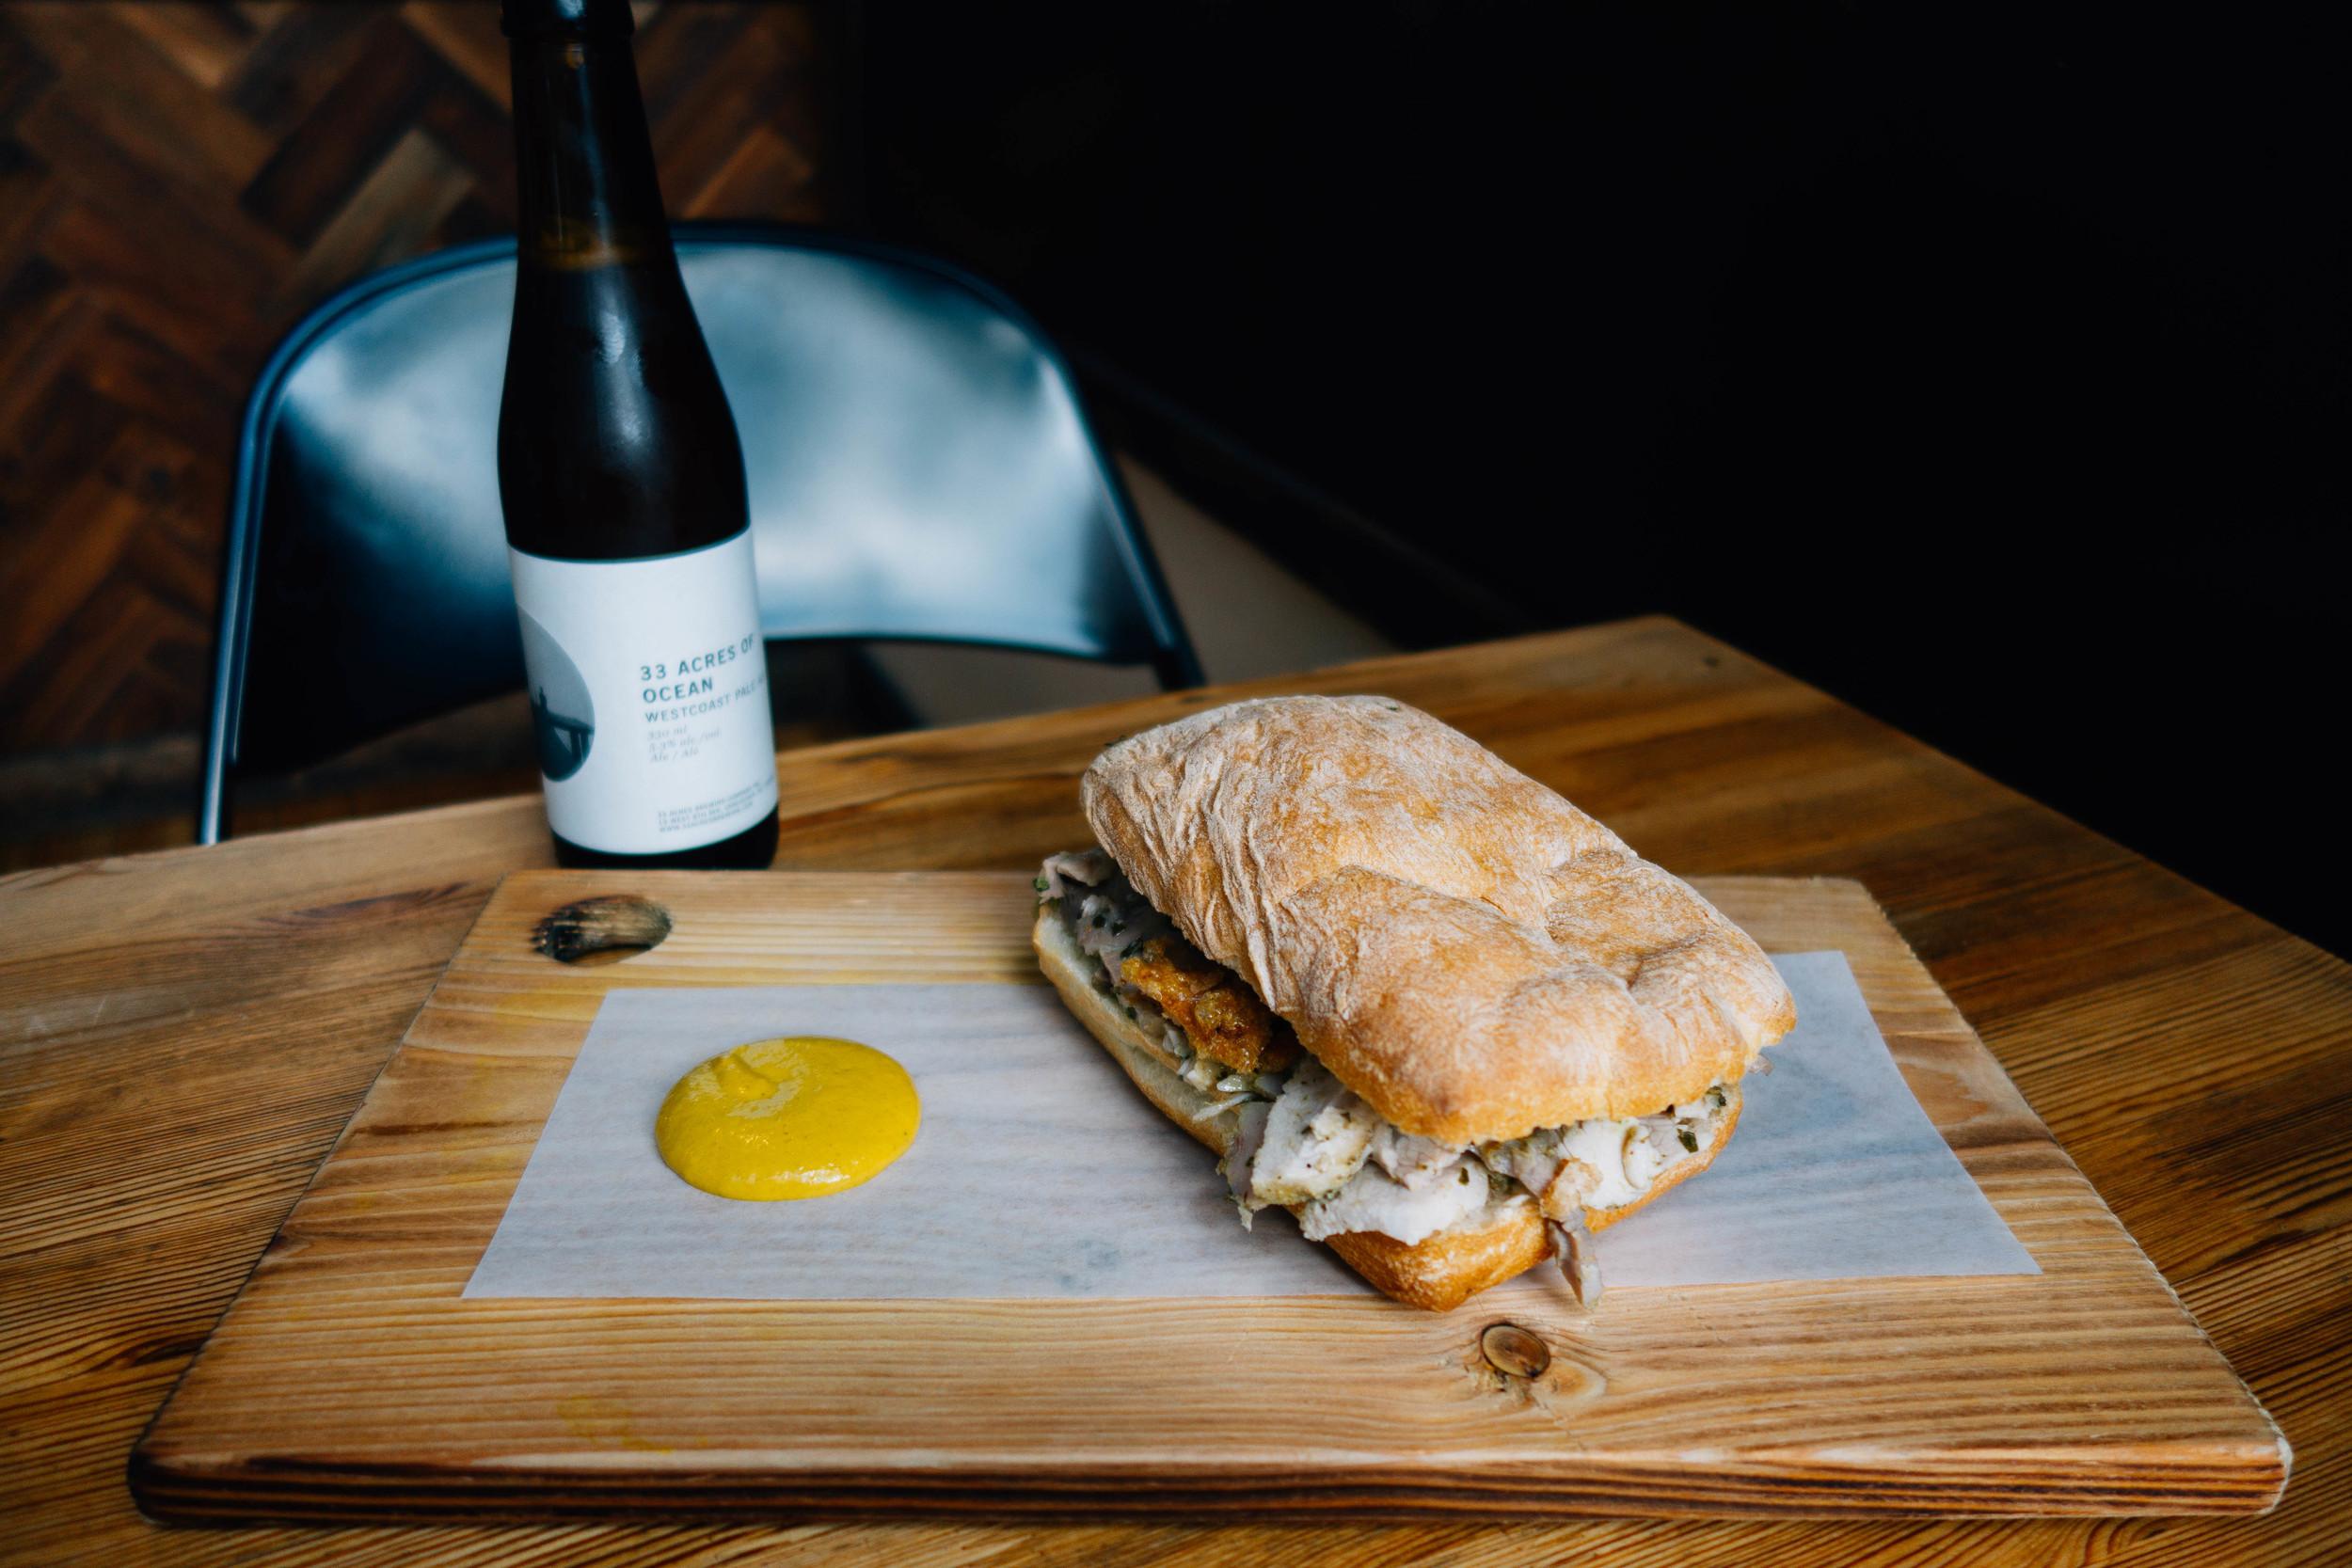 Meat & Bread Vancouver Voyage Collective Billie Norman